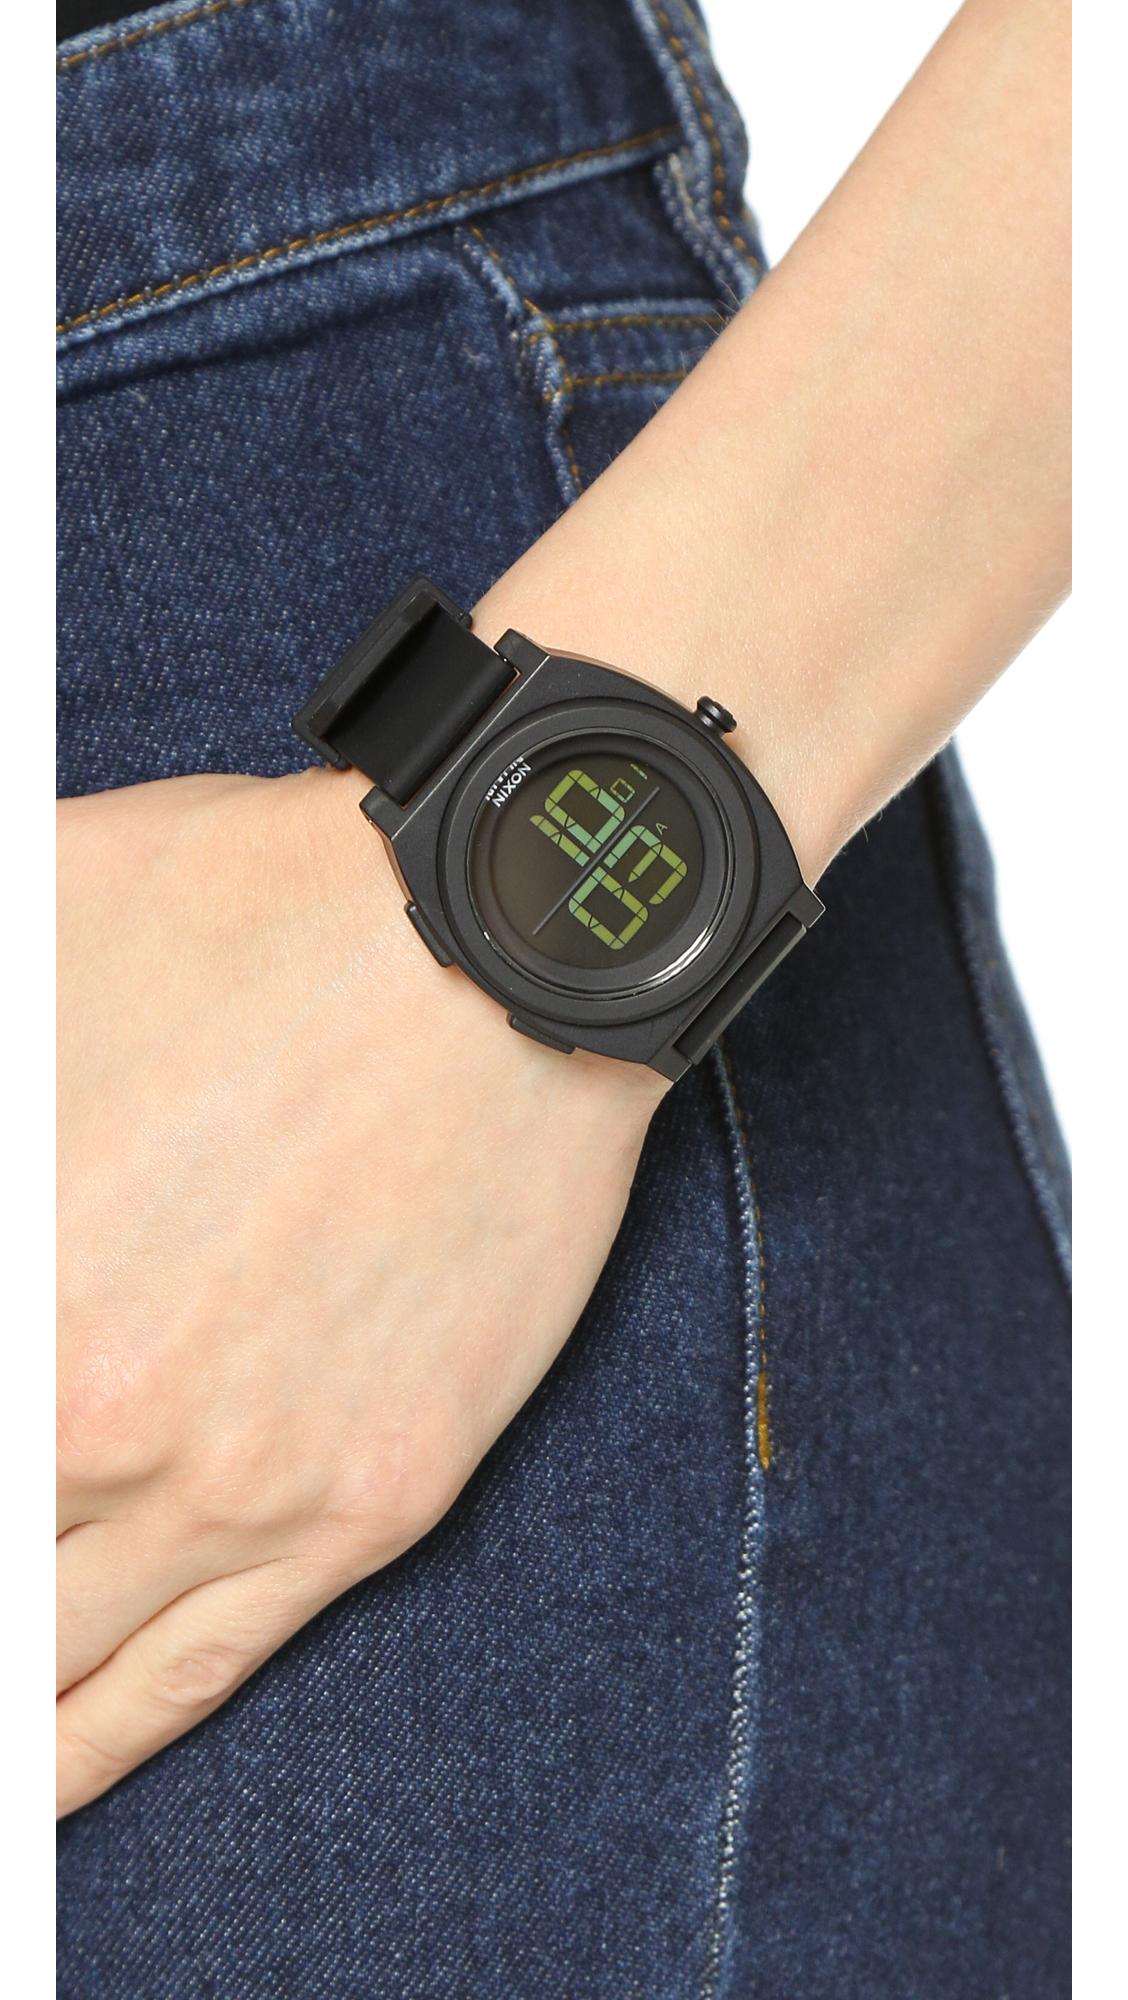 82df0c5b999 Lyst - Nixon Time Teller Digi Watch - All Black in Black